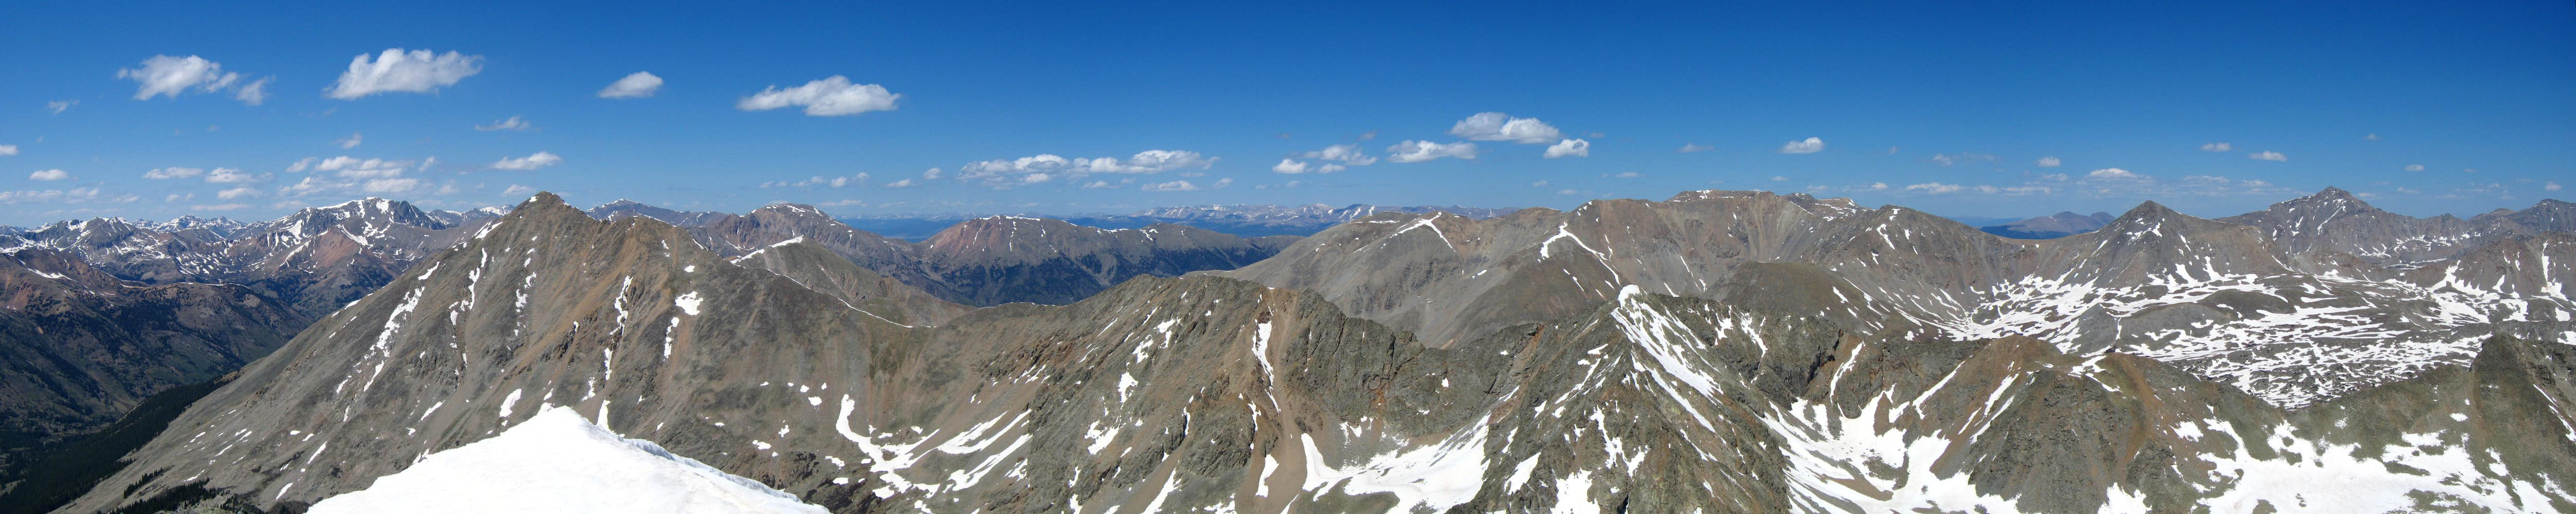 North Apostle Summit Panorama